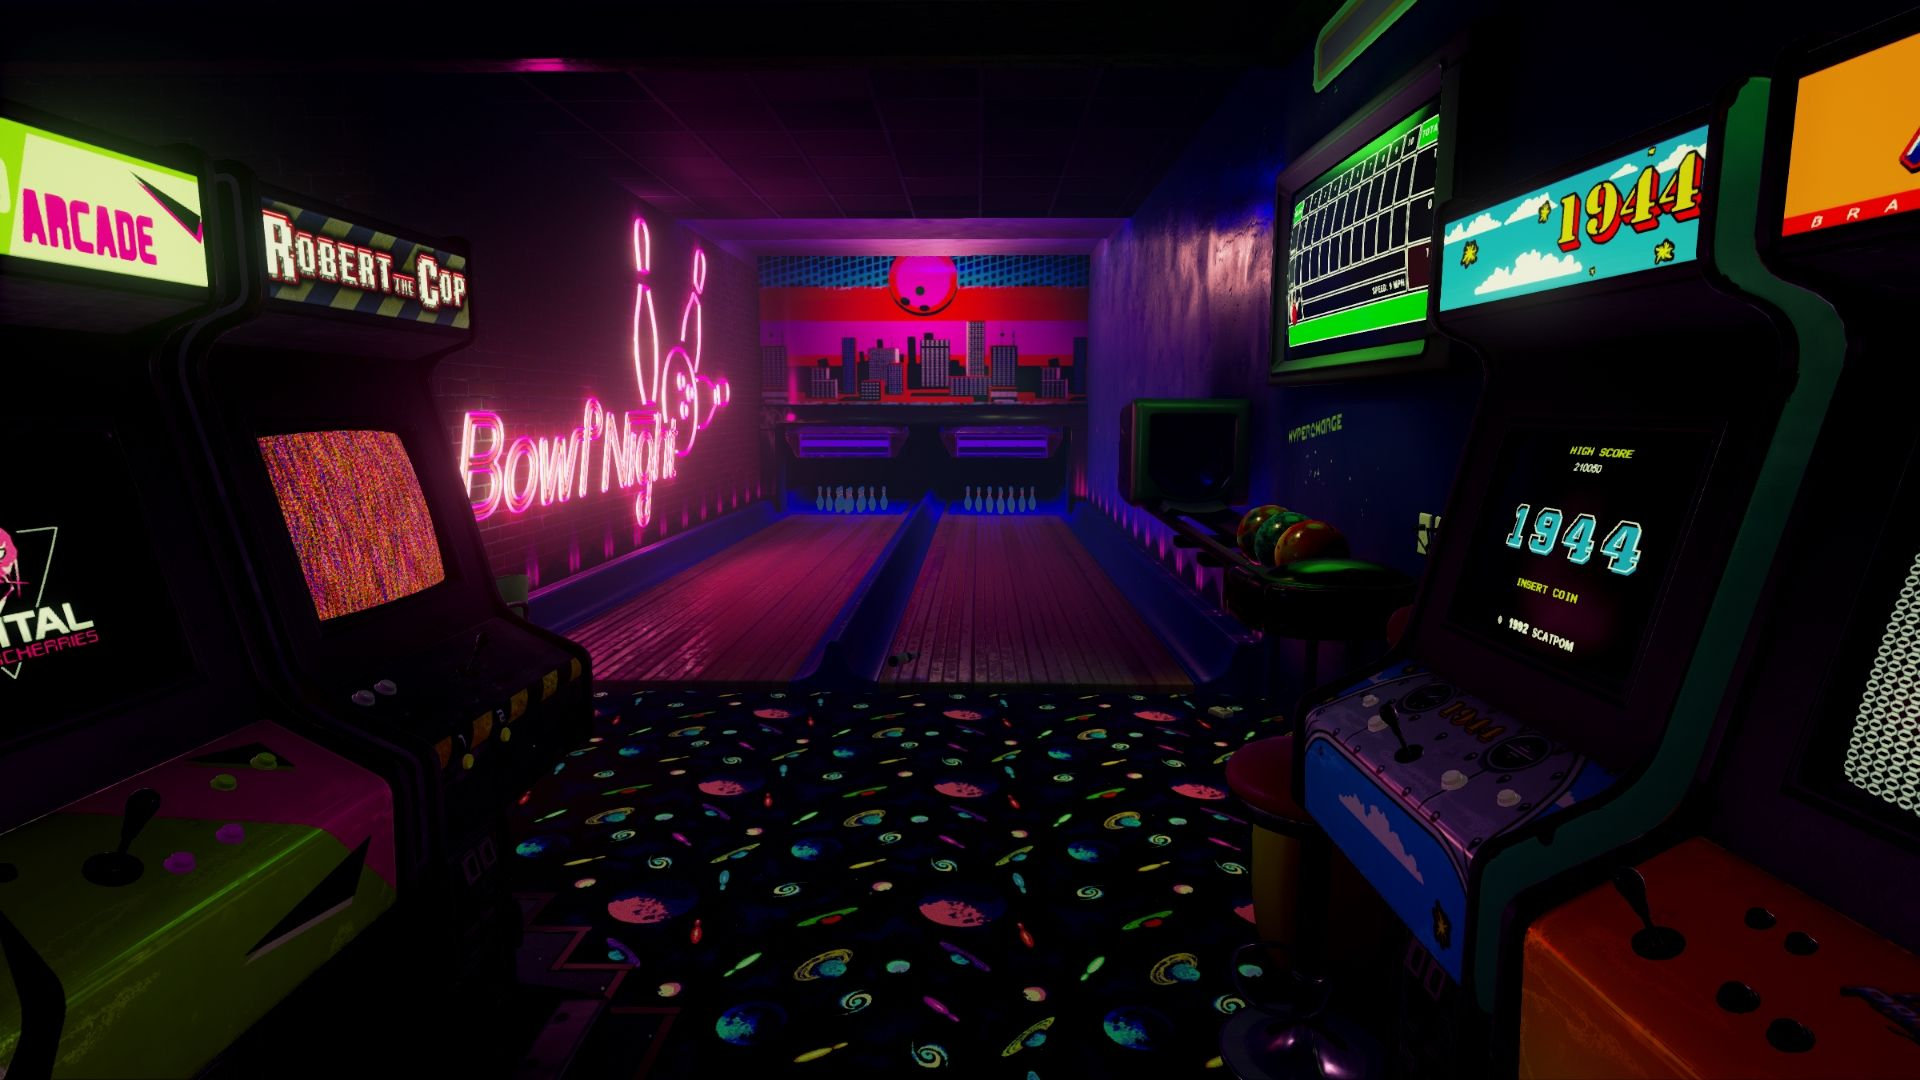 New Retro Arcade Neon 5 in 2020 Room wallpaper designs